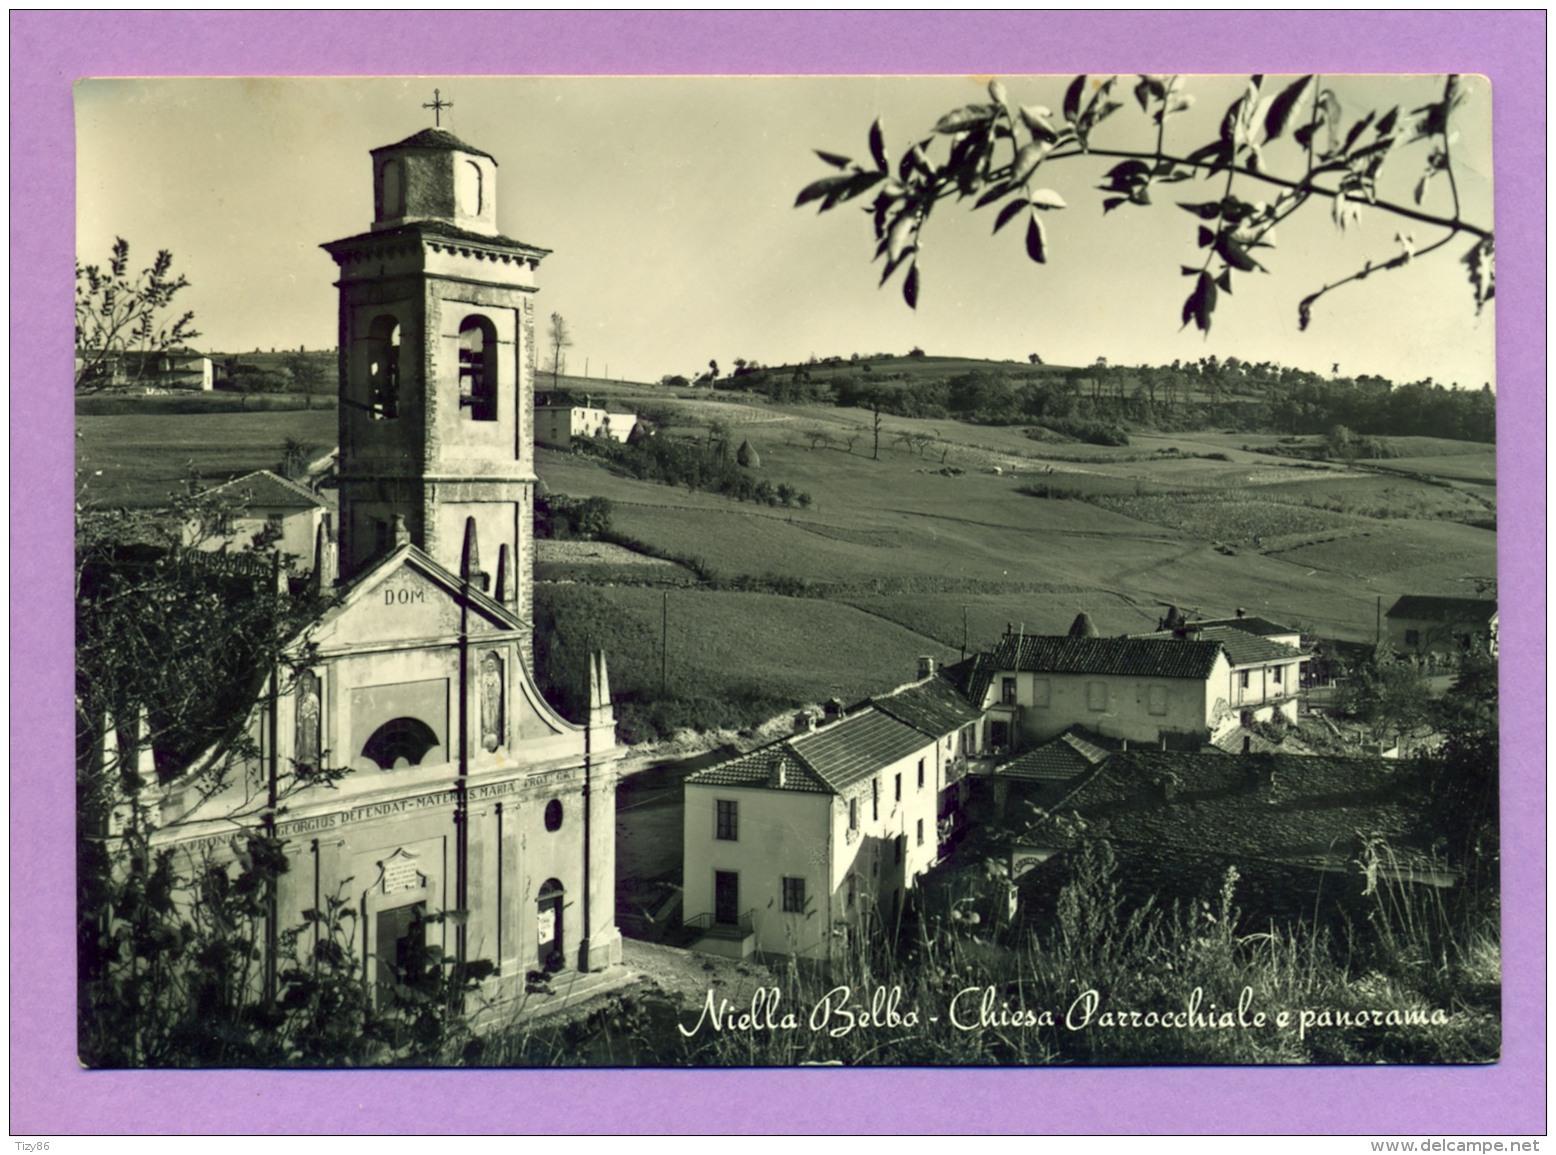 Niella Belbo - Chiesa Parrocchiale E Panorama - Cuneo